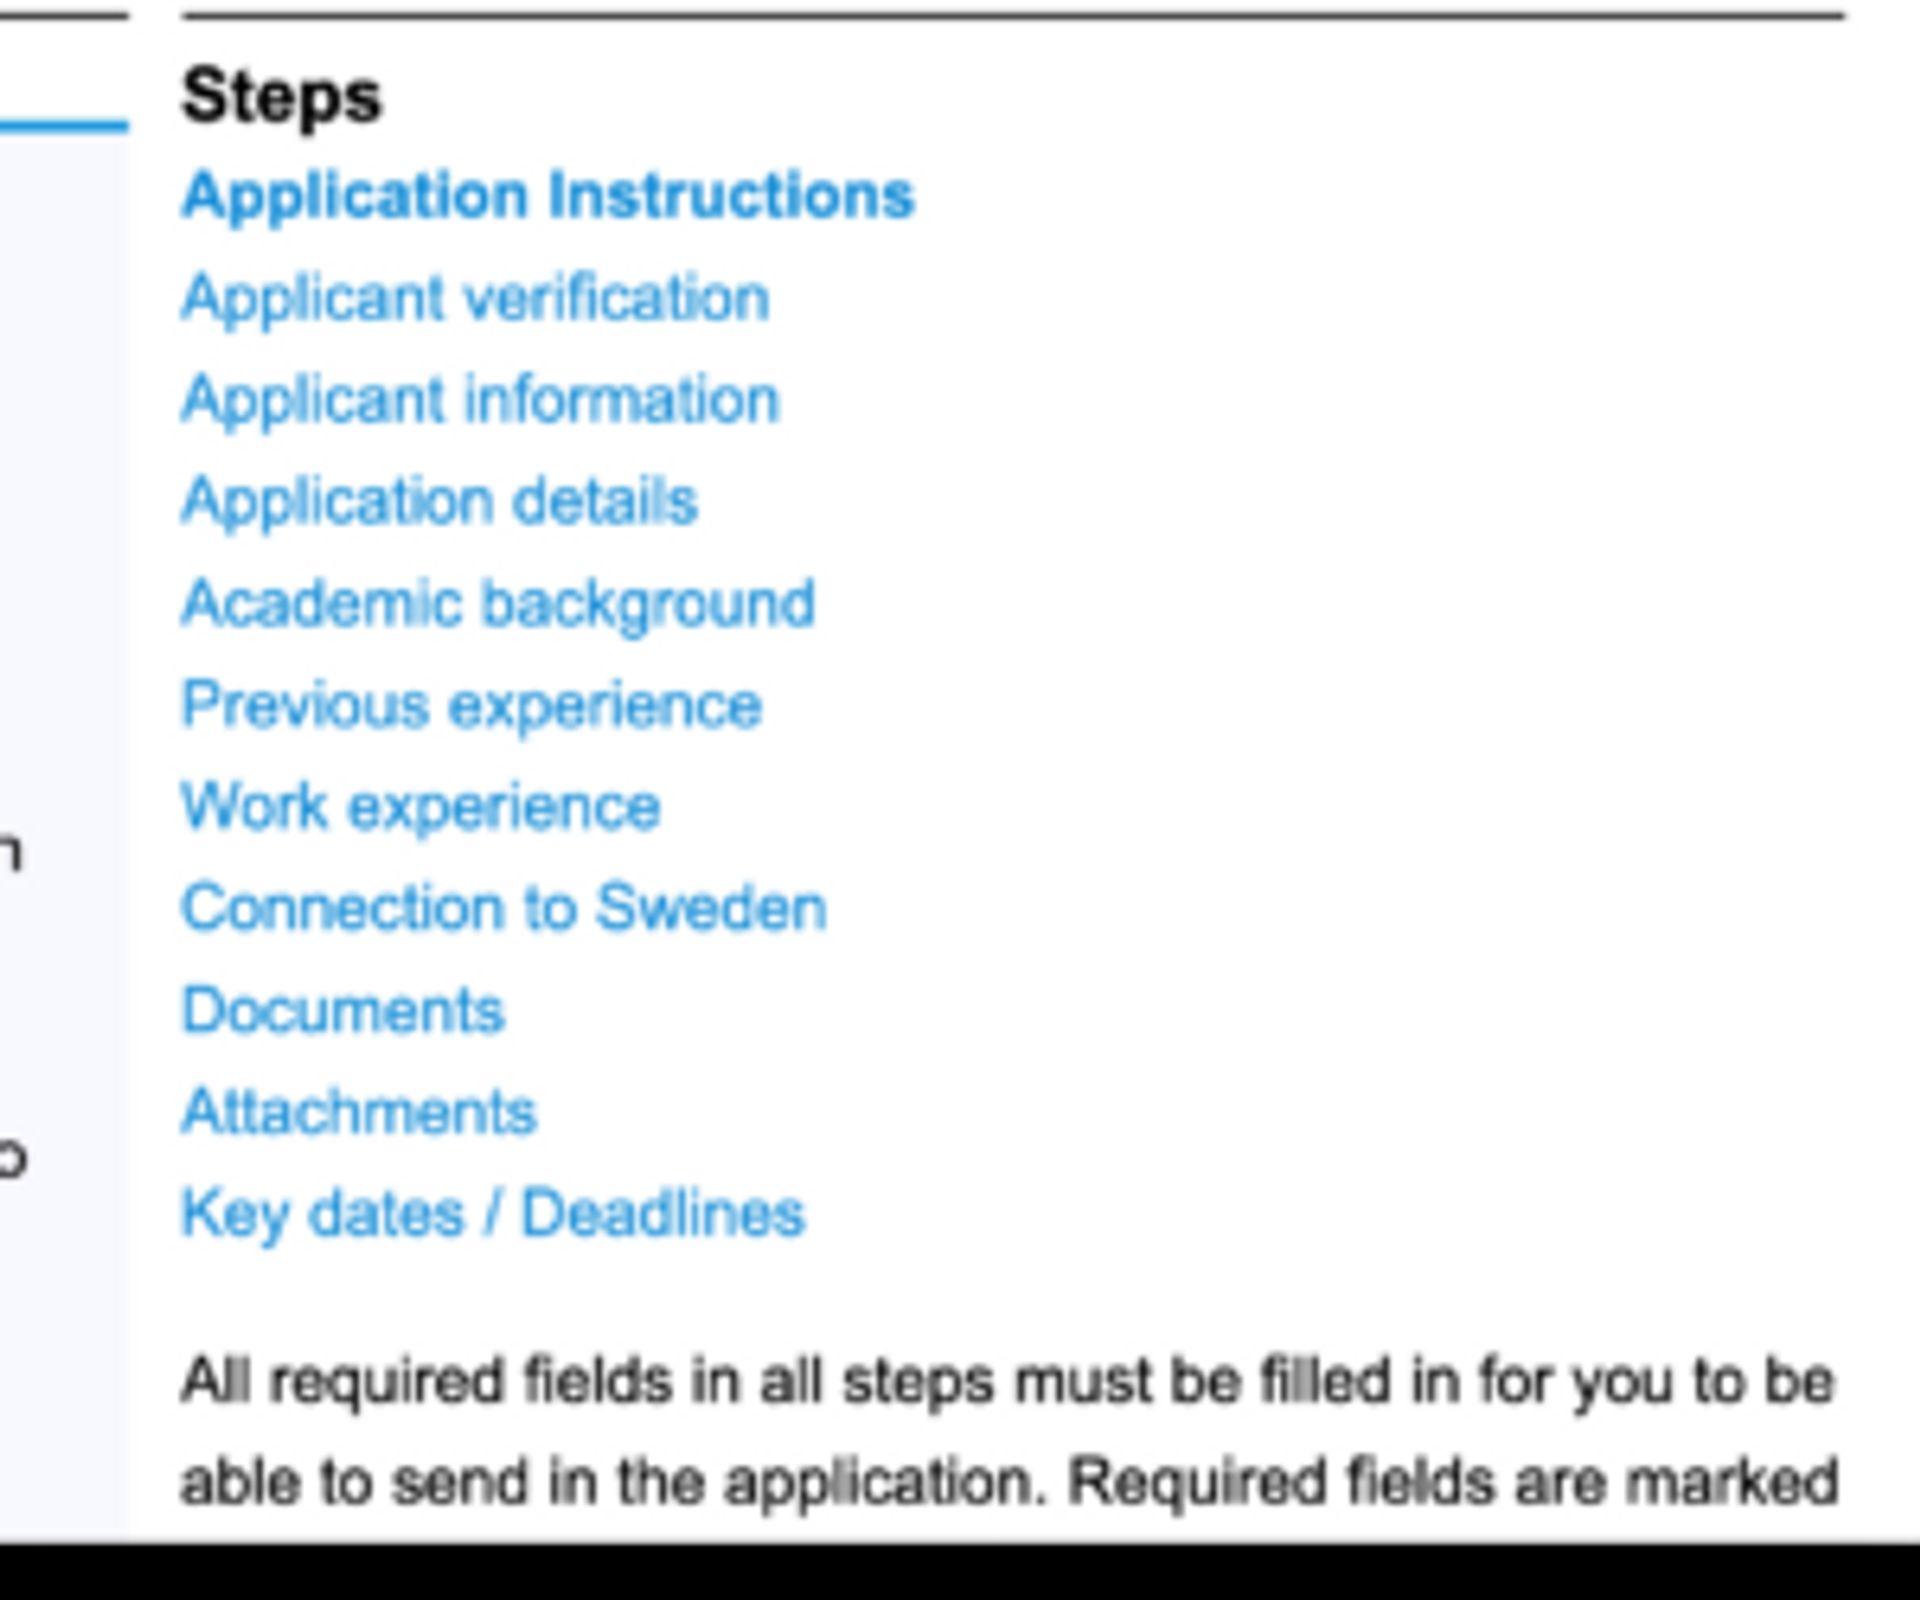 Screenshot showing application instructions.